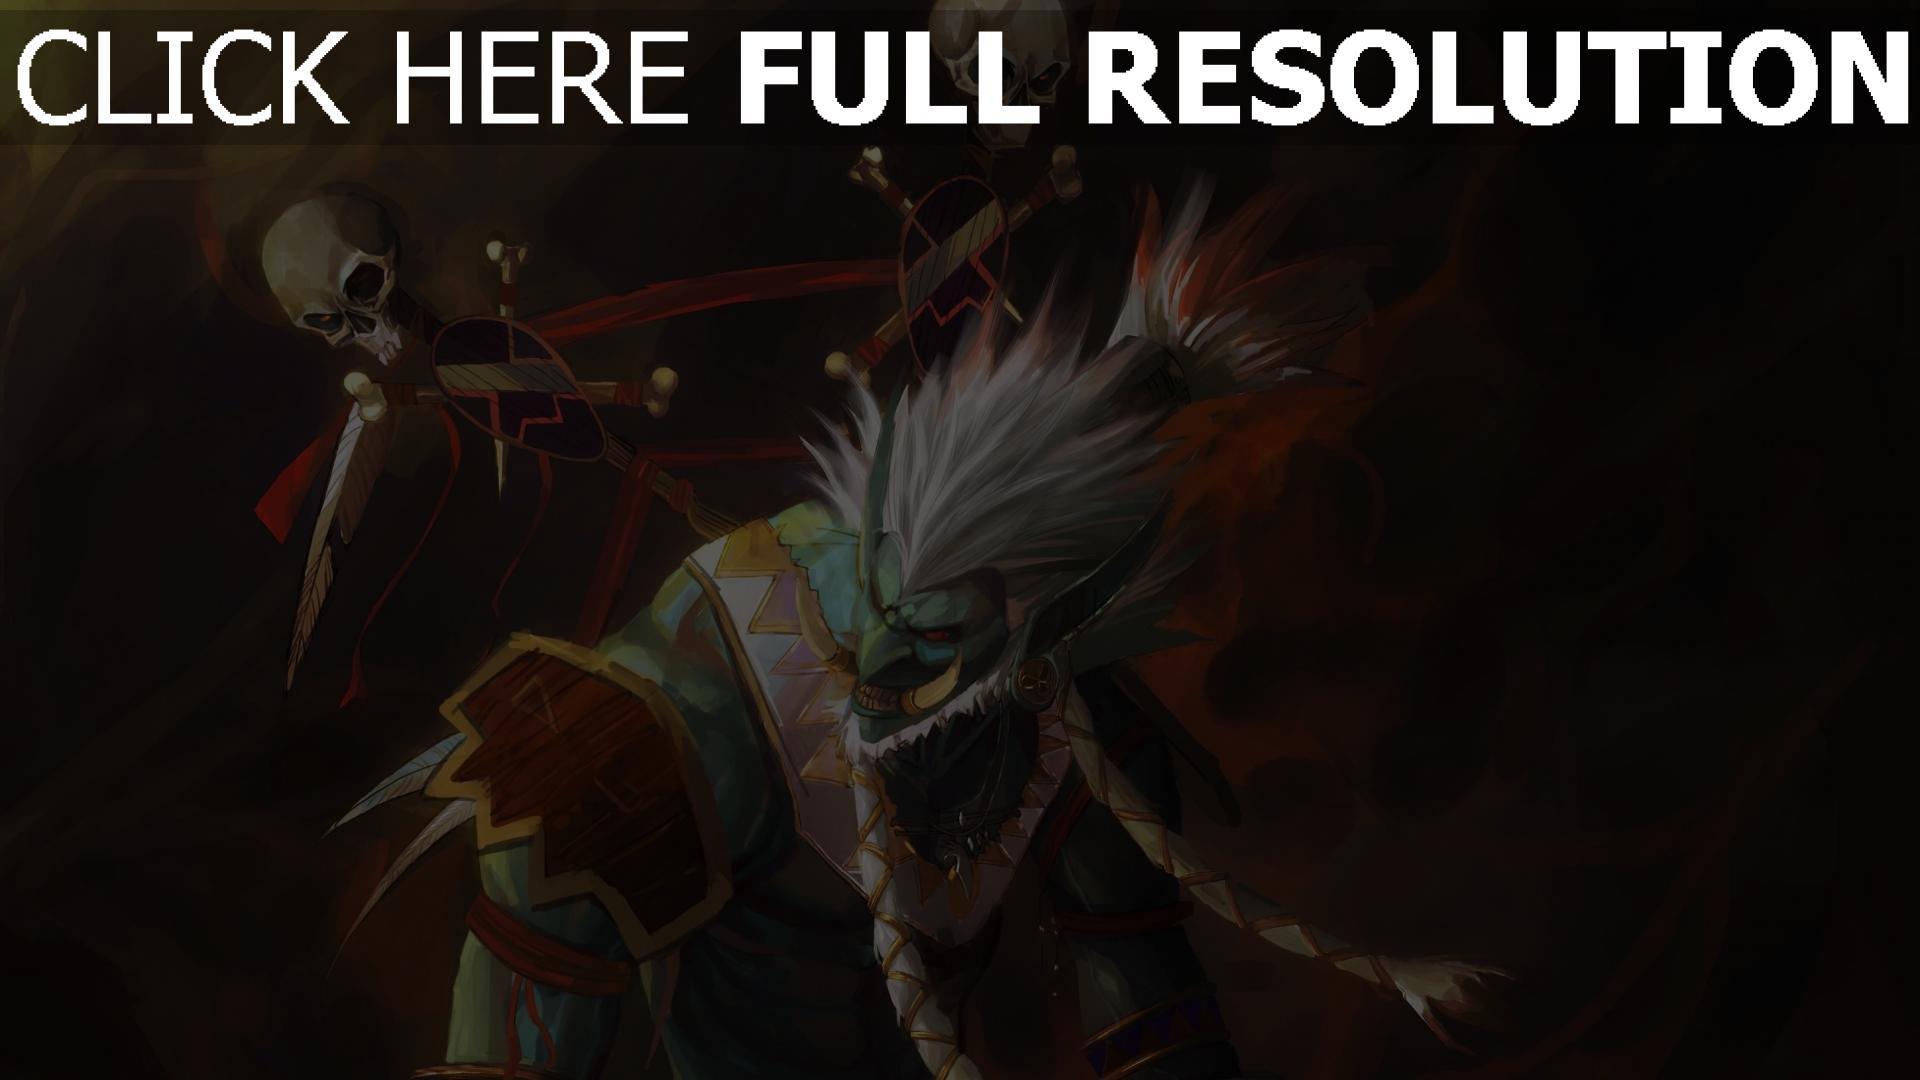 hd hintergrundbilder world of warcraft, troll, shaman, totem 1920x1080